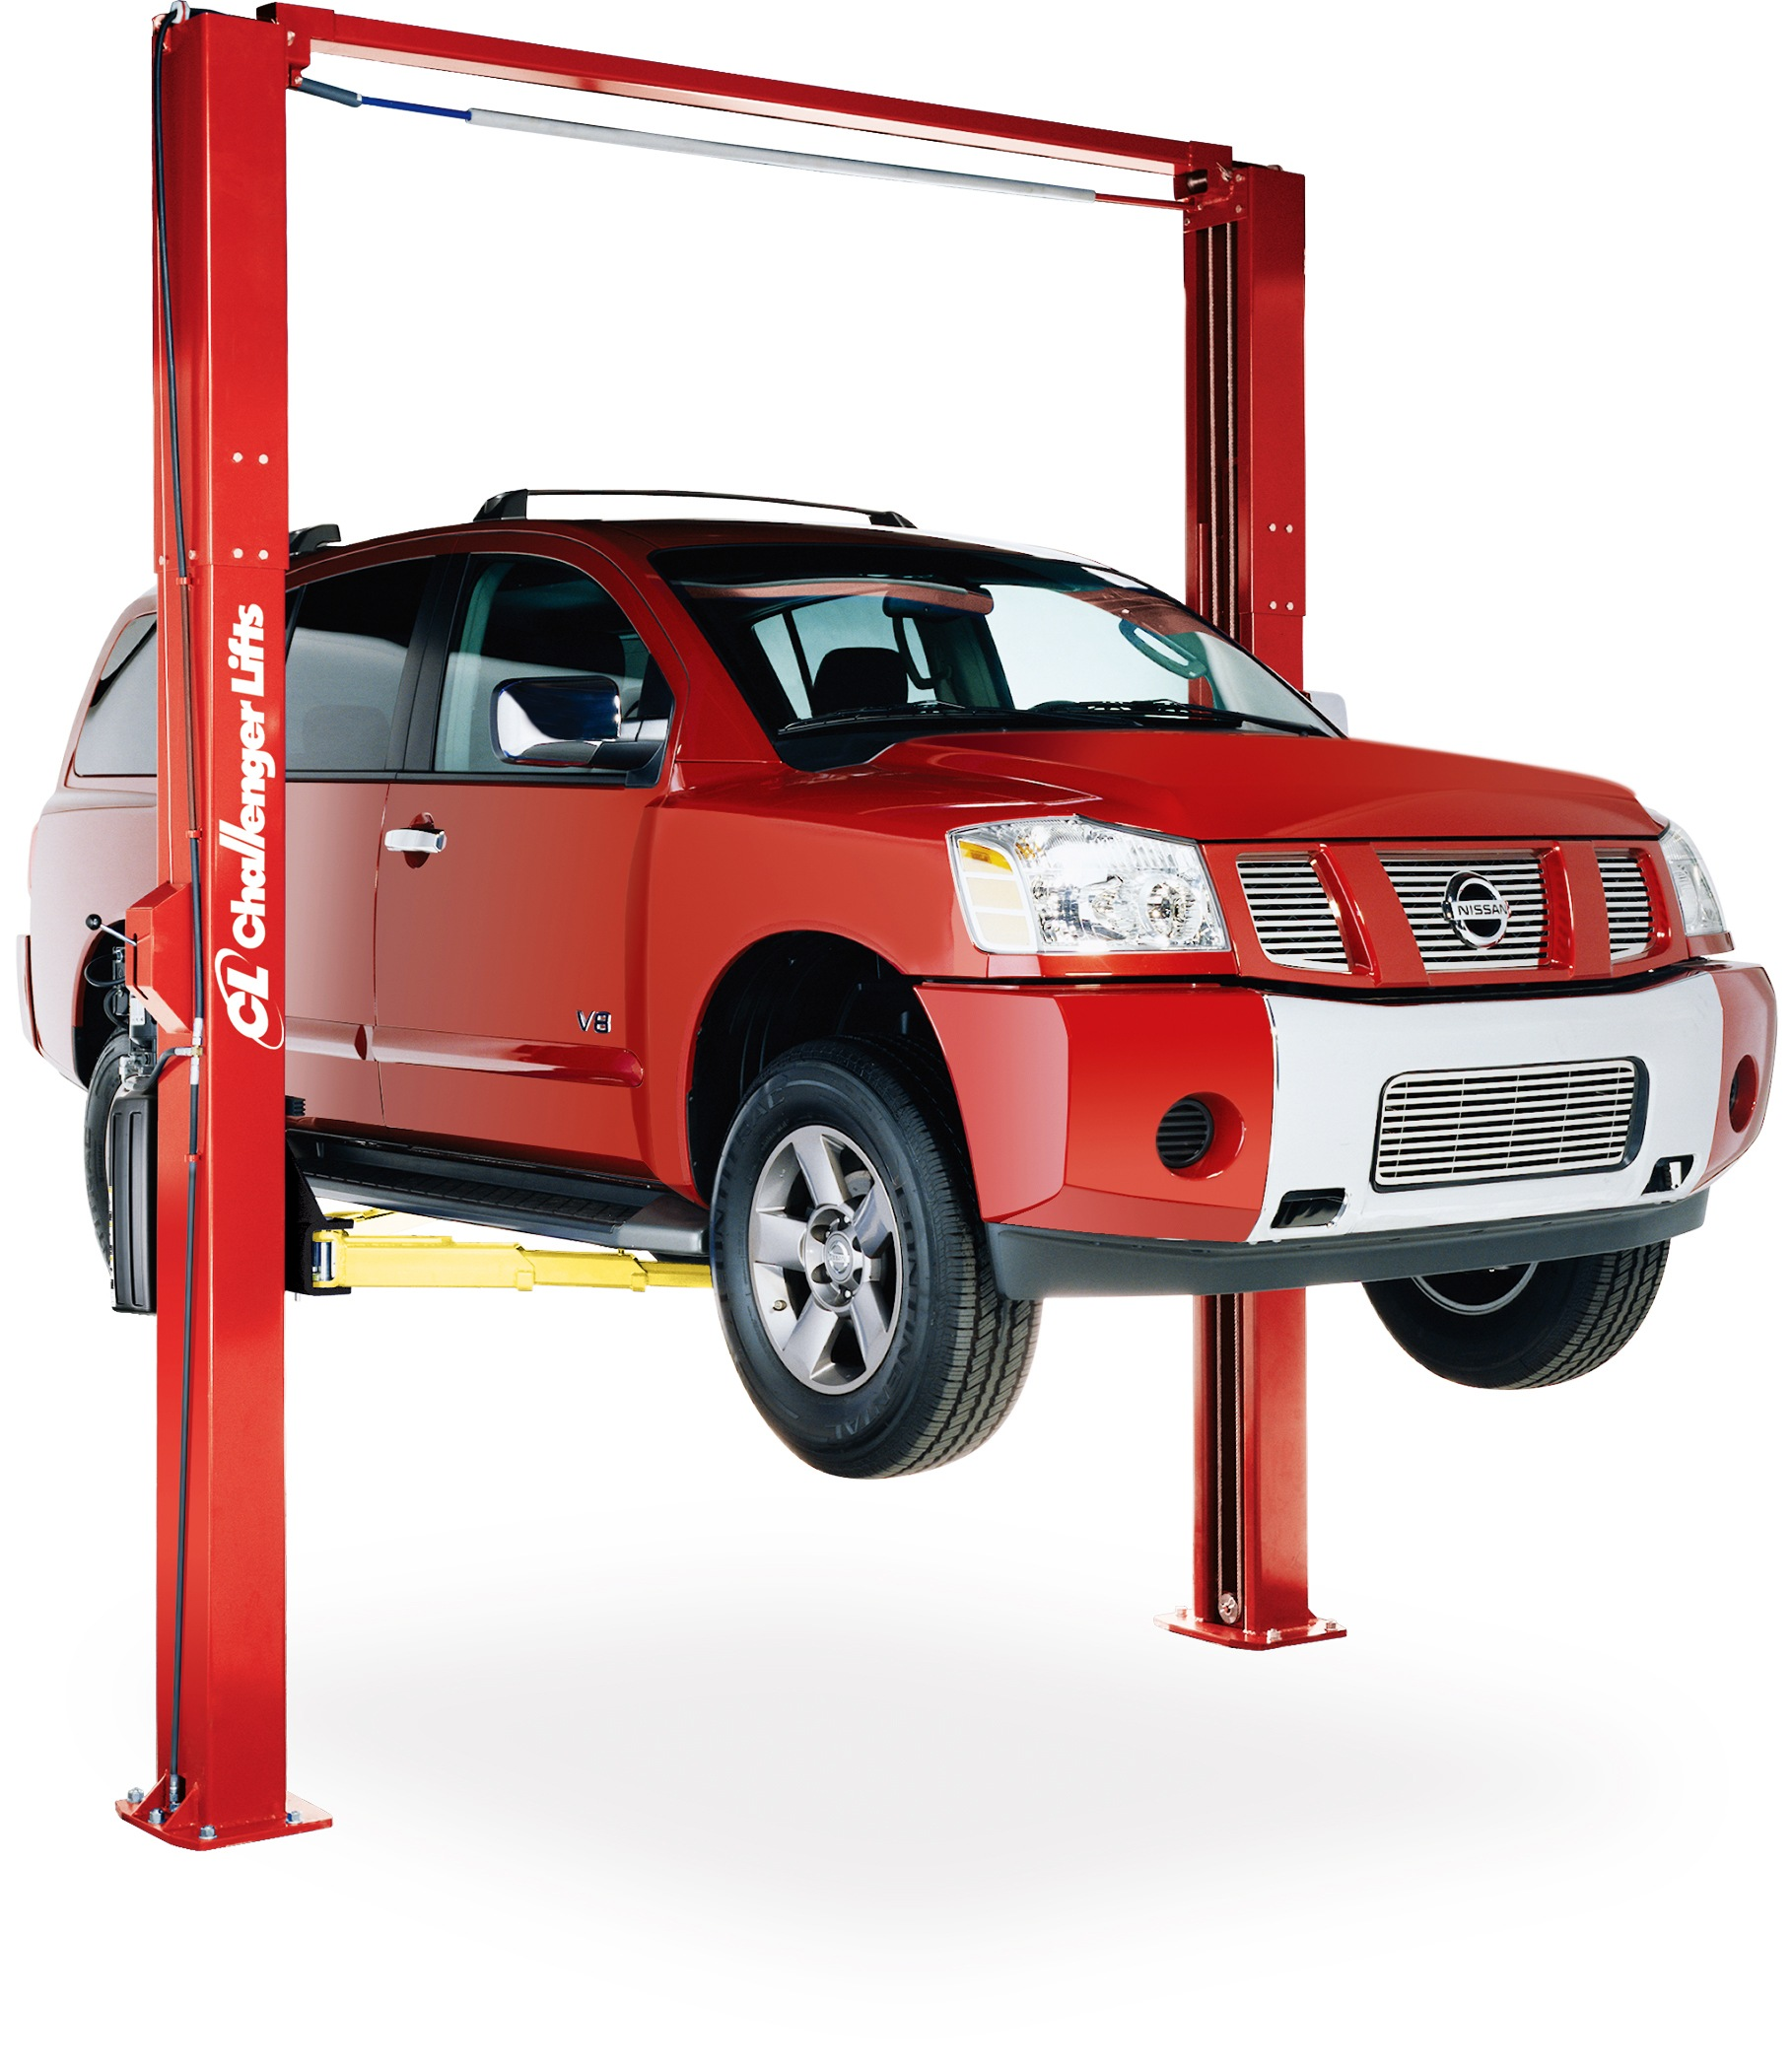 cl e10 symmetric?t\=1461343594 tuxedo car lift wiring diagram wiring diagrams Car Lift at soozxer.org